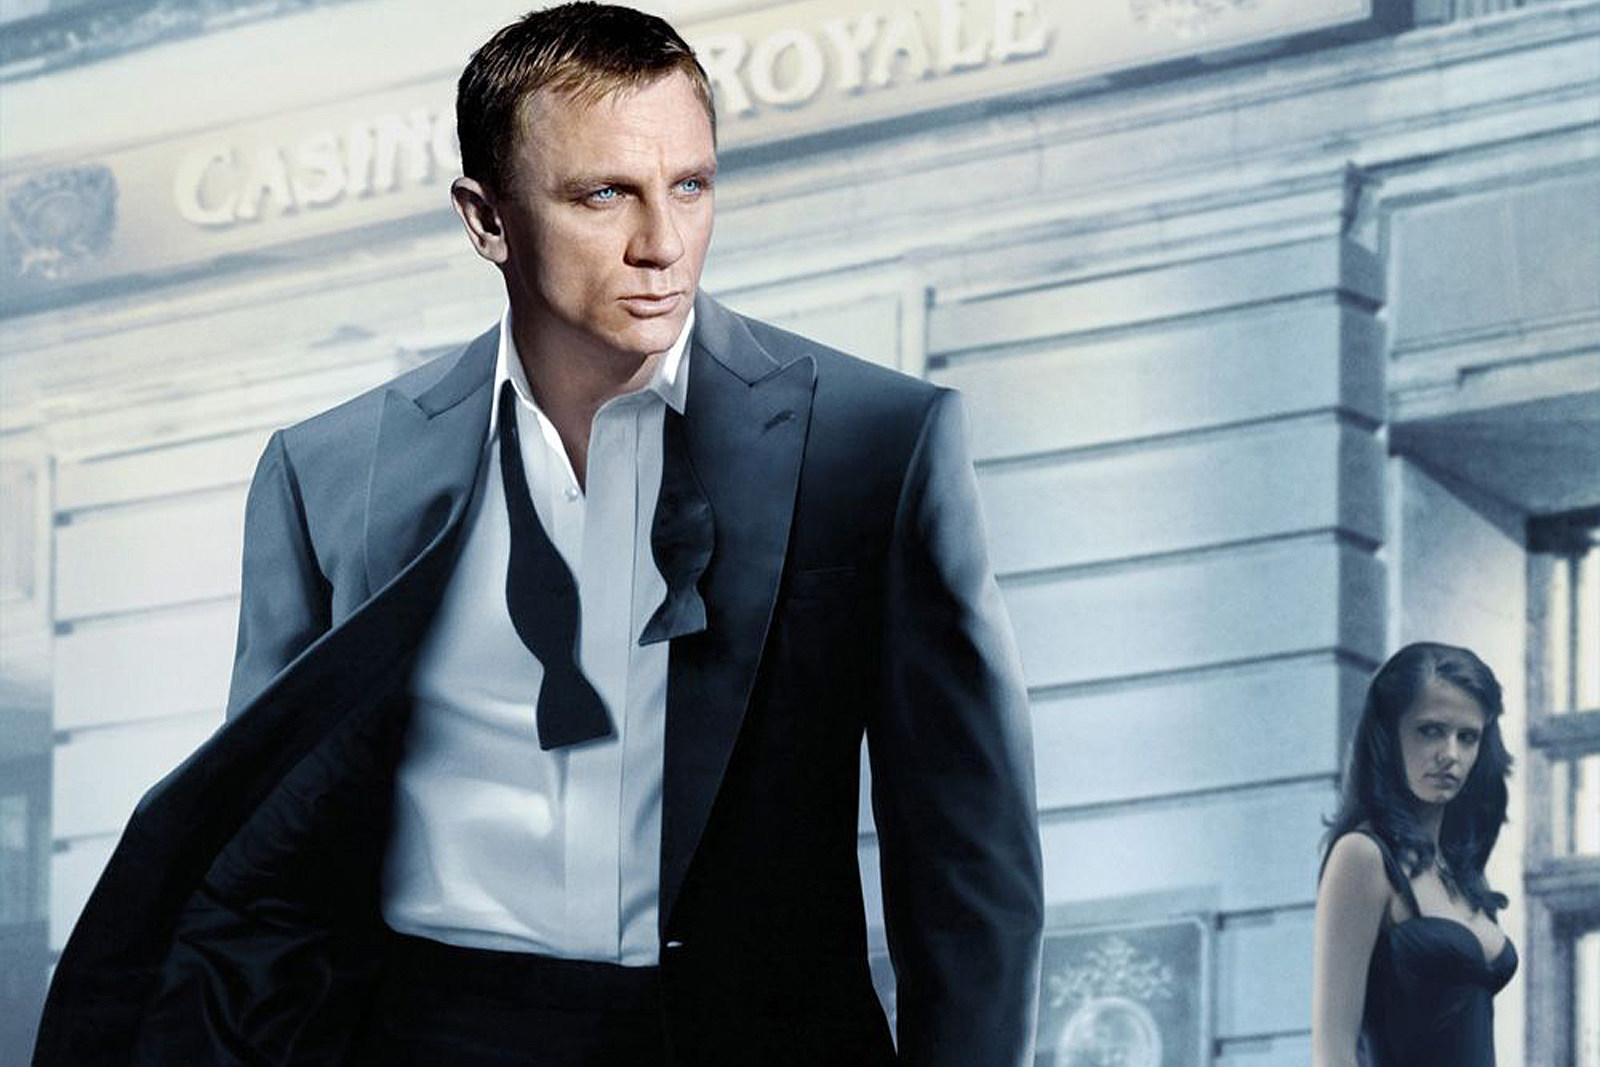 Bond casino royale plot popcap 2 games